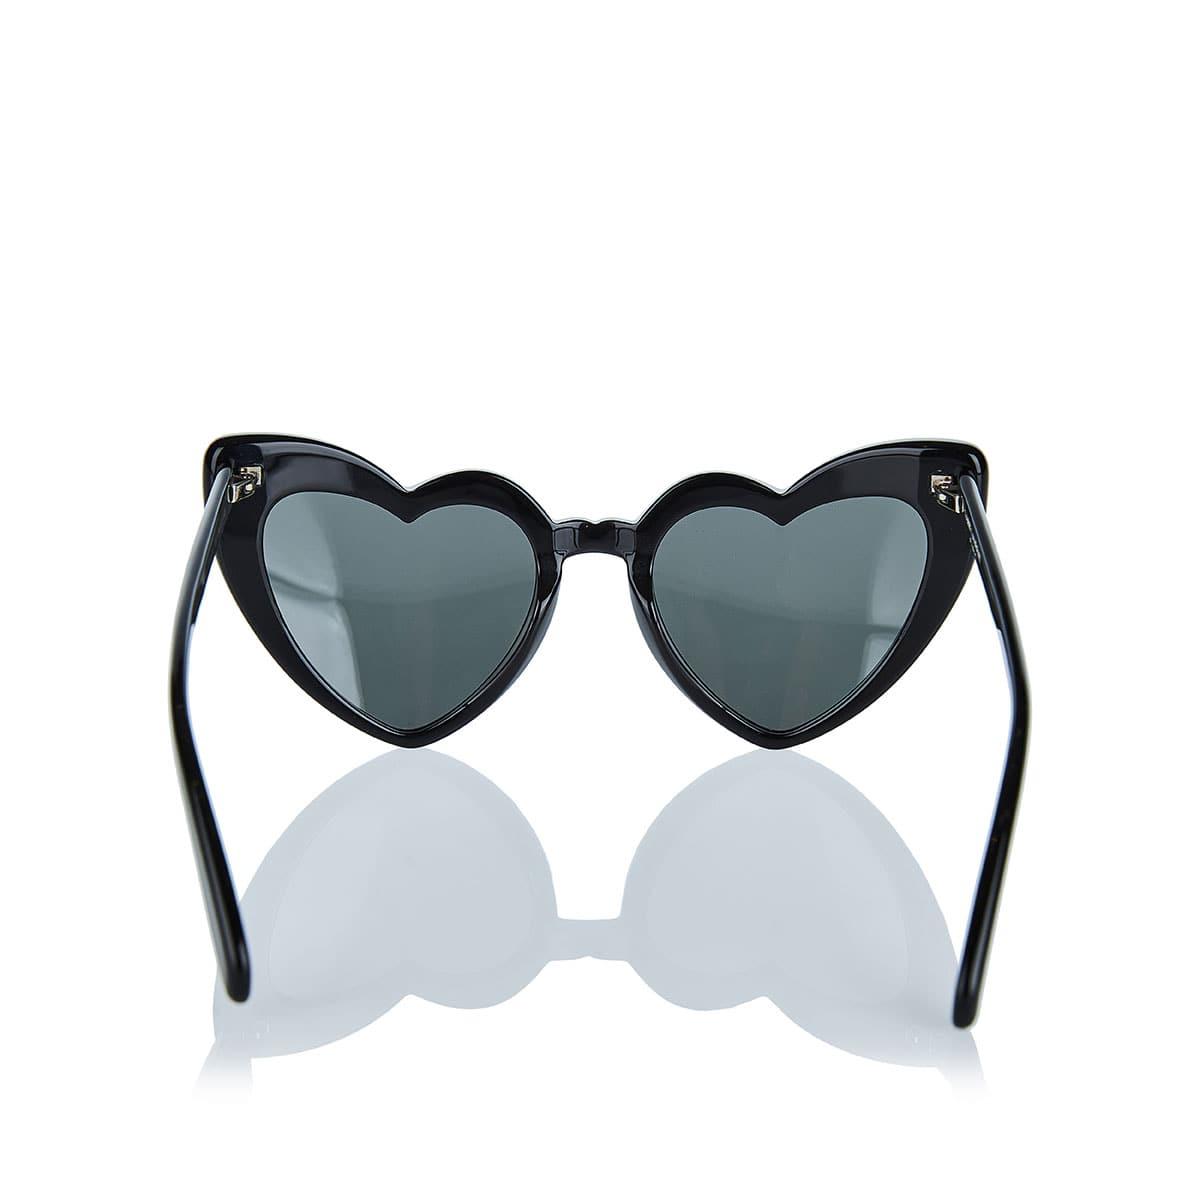 New Wave SL181 Loulou sunglasses